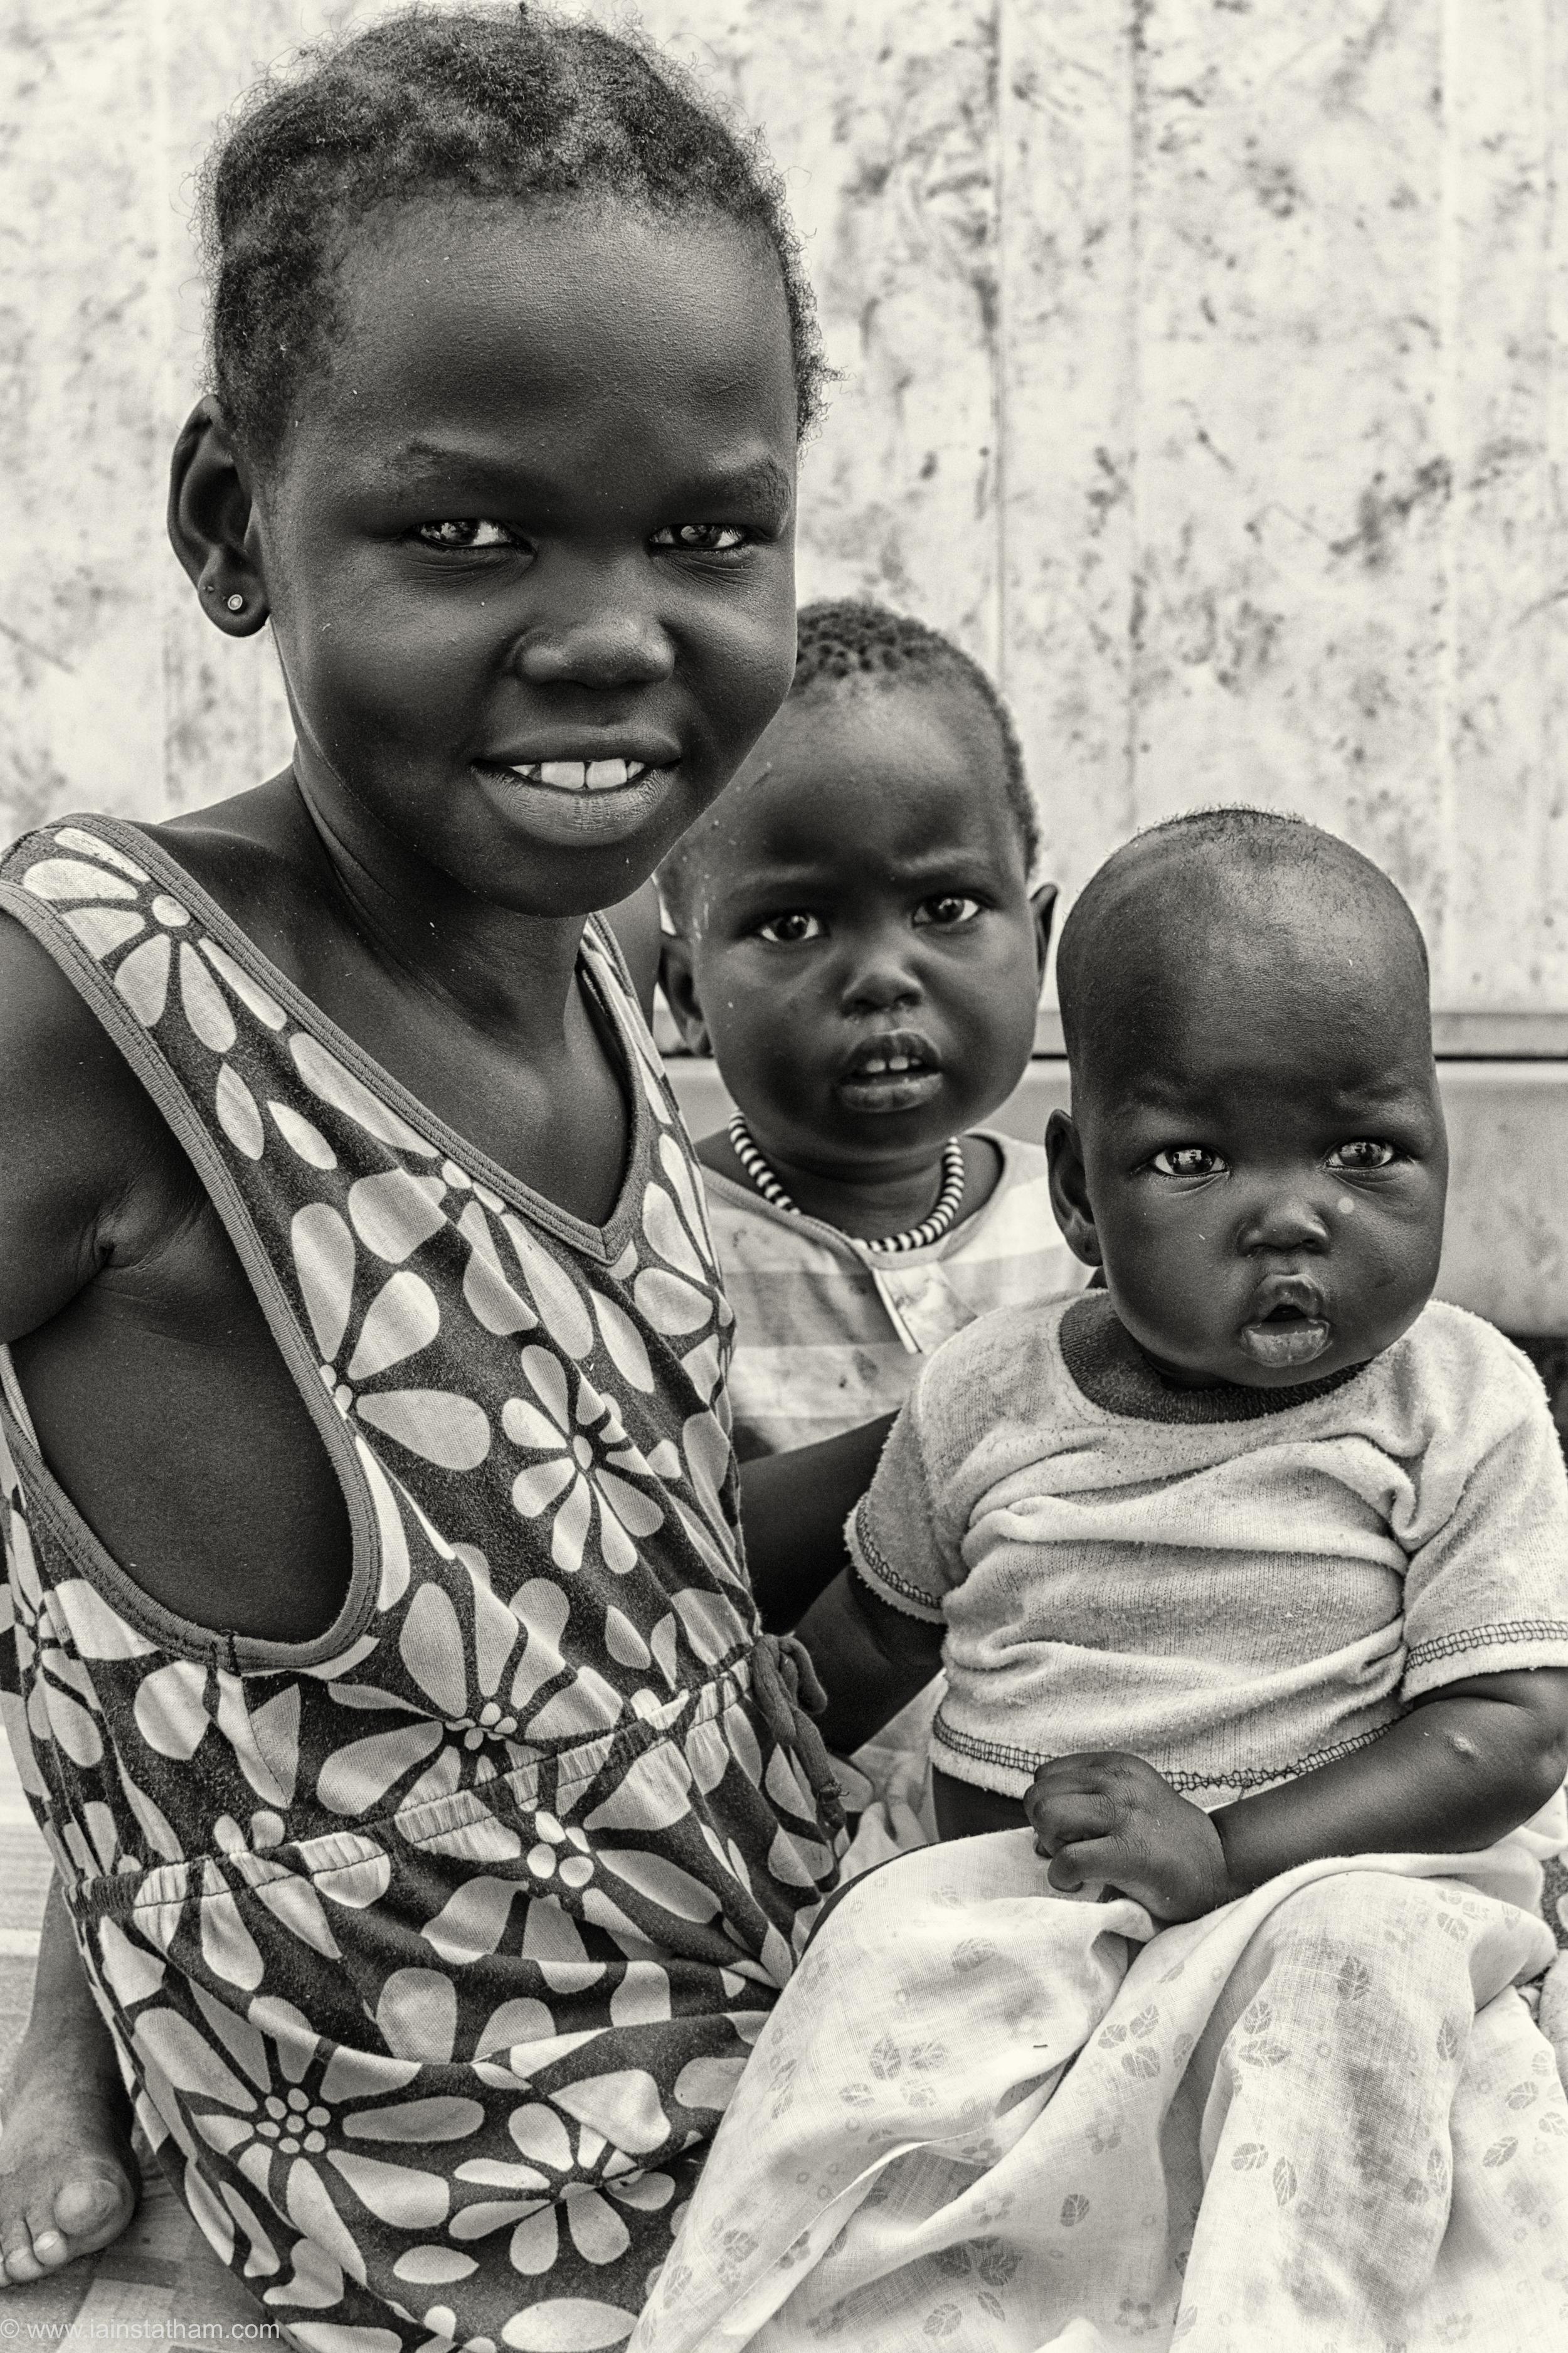 ug - south sudan refugees - dziapi - bw-13.jpg